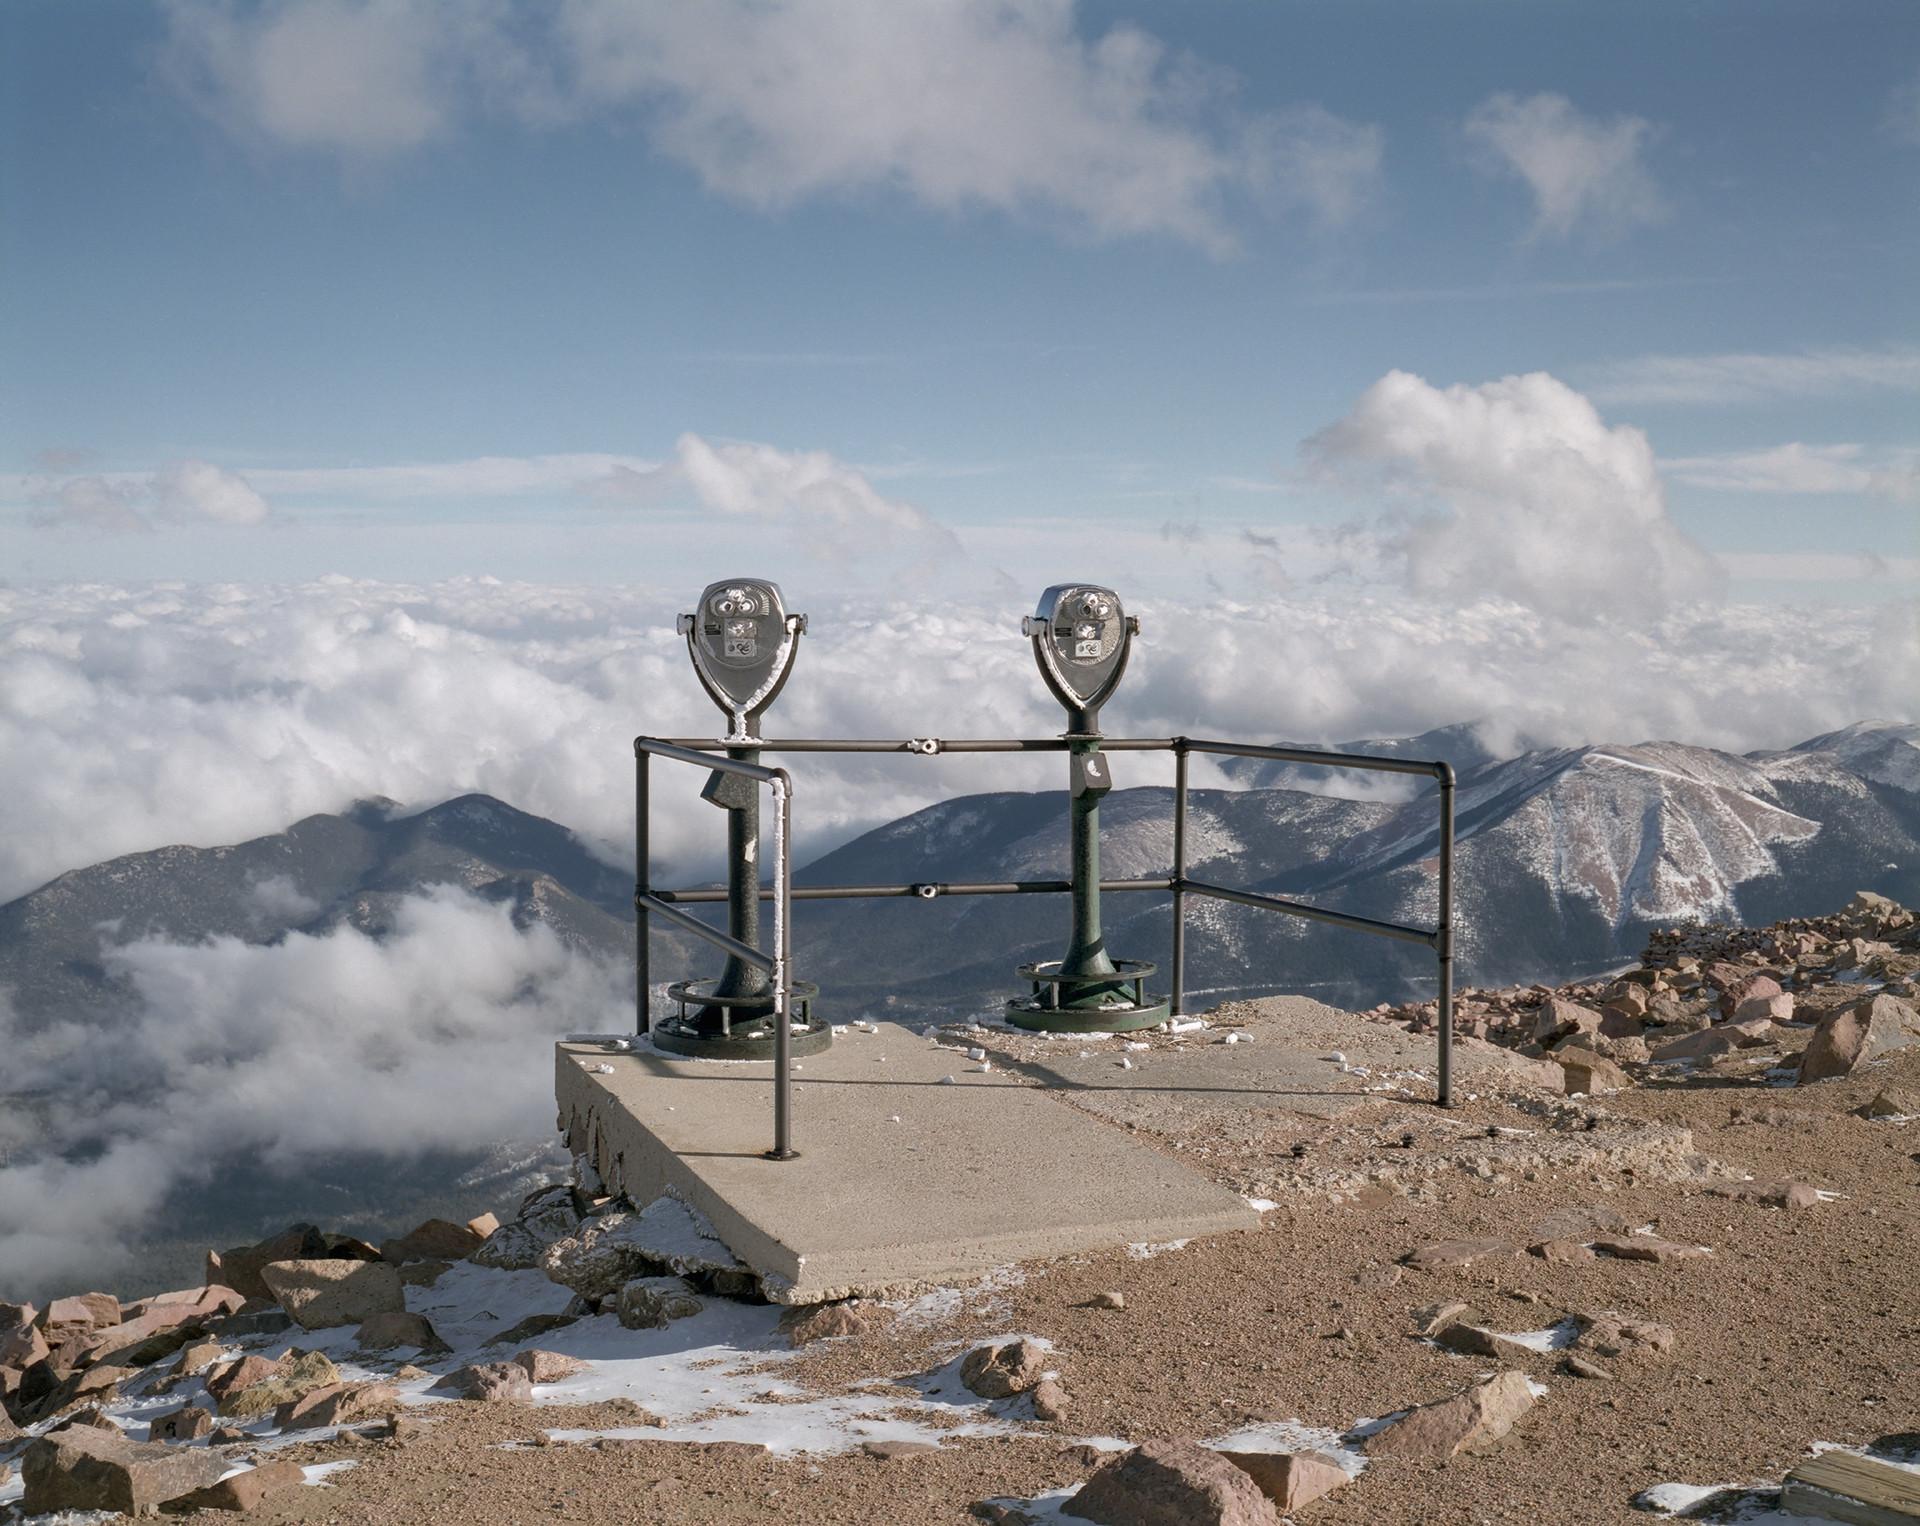 Observatory, medium format color film, 2020